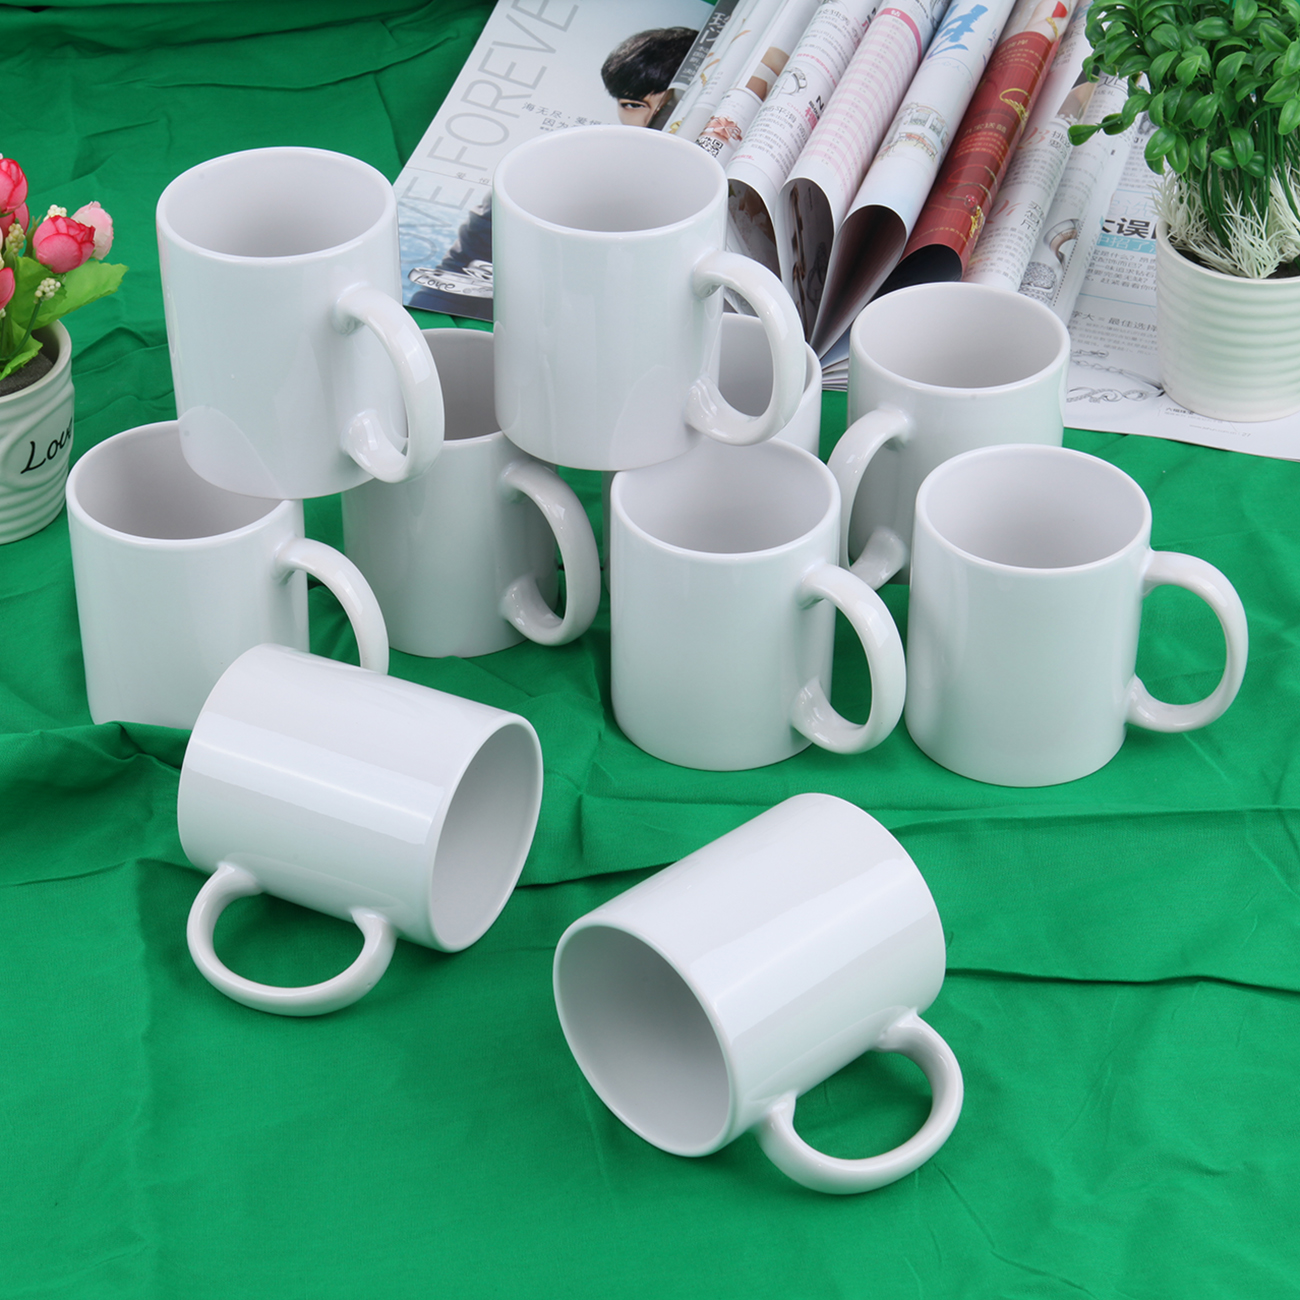 36pcs Sublimation Mug 11oz Coated DIY Heat Transfer Print White Cups Mugs